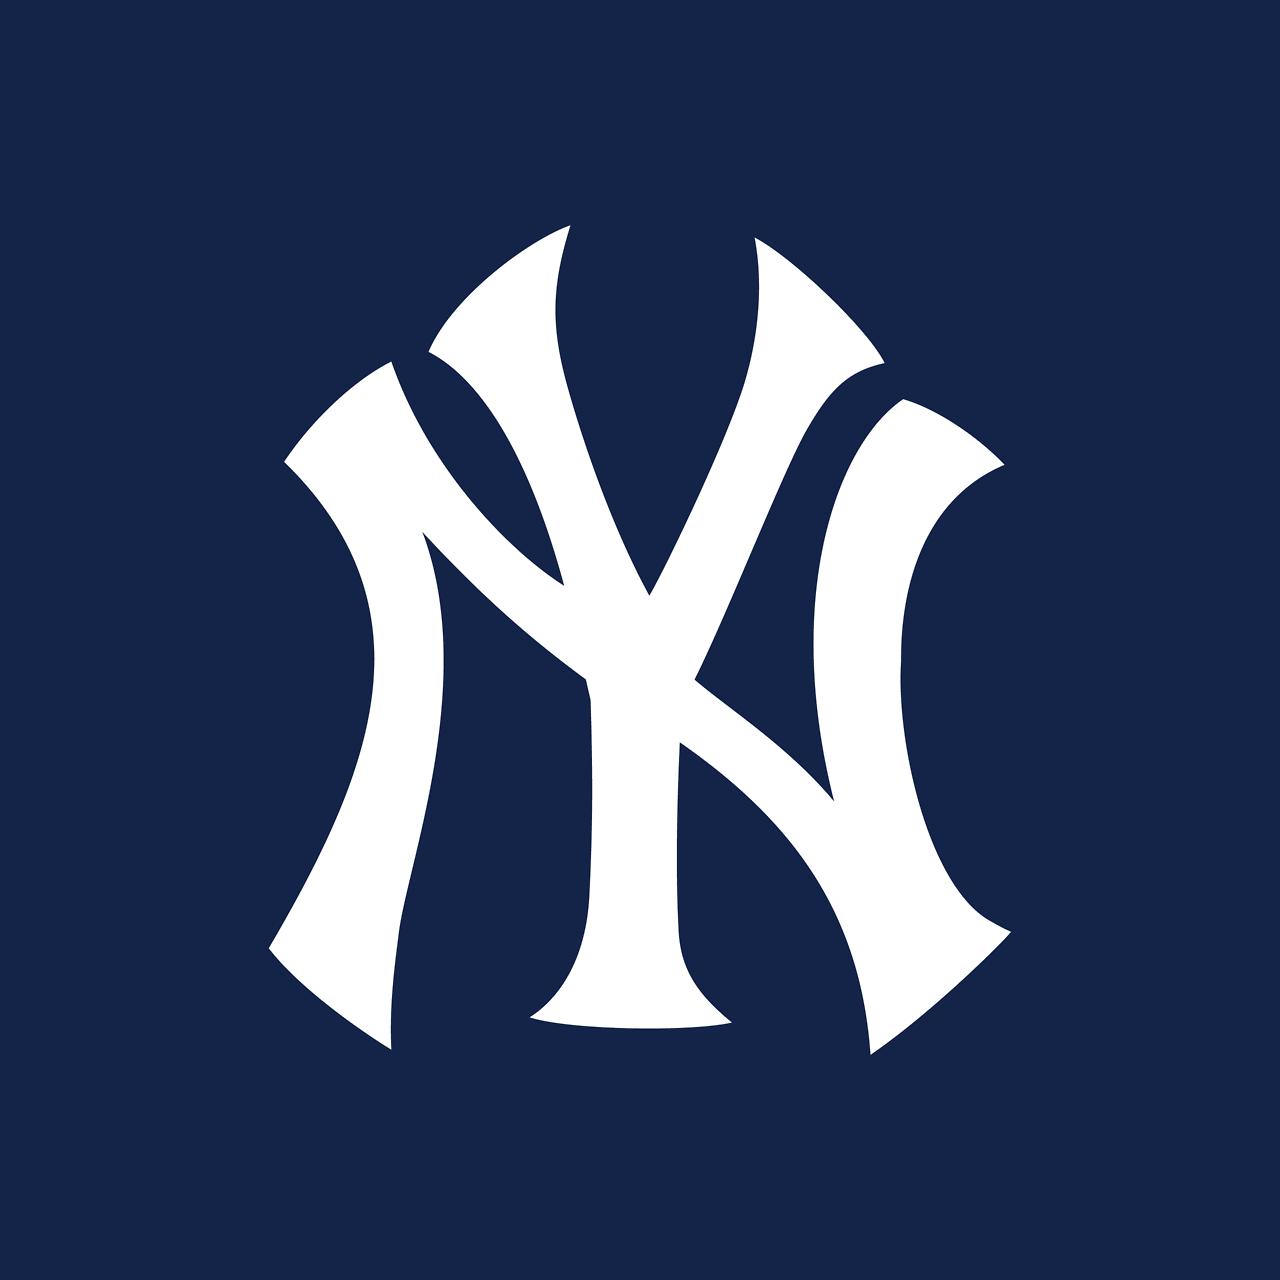 New York Yankees Mlb Designer Louis B Tiffany Firm Tiffany Co Usa Year 1909 Modified In 191 Logo Inspiration Team Decal Fashion Logo Inspiration